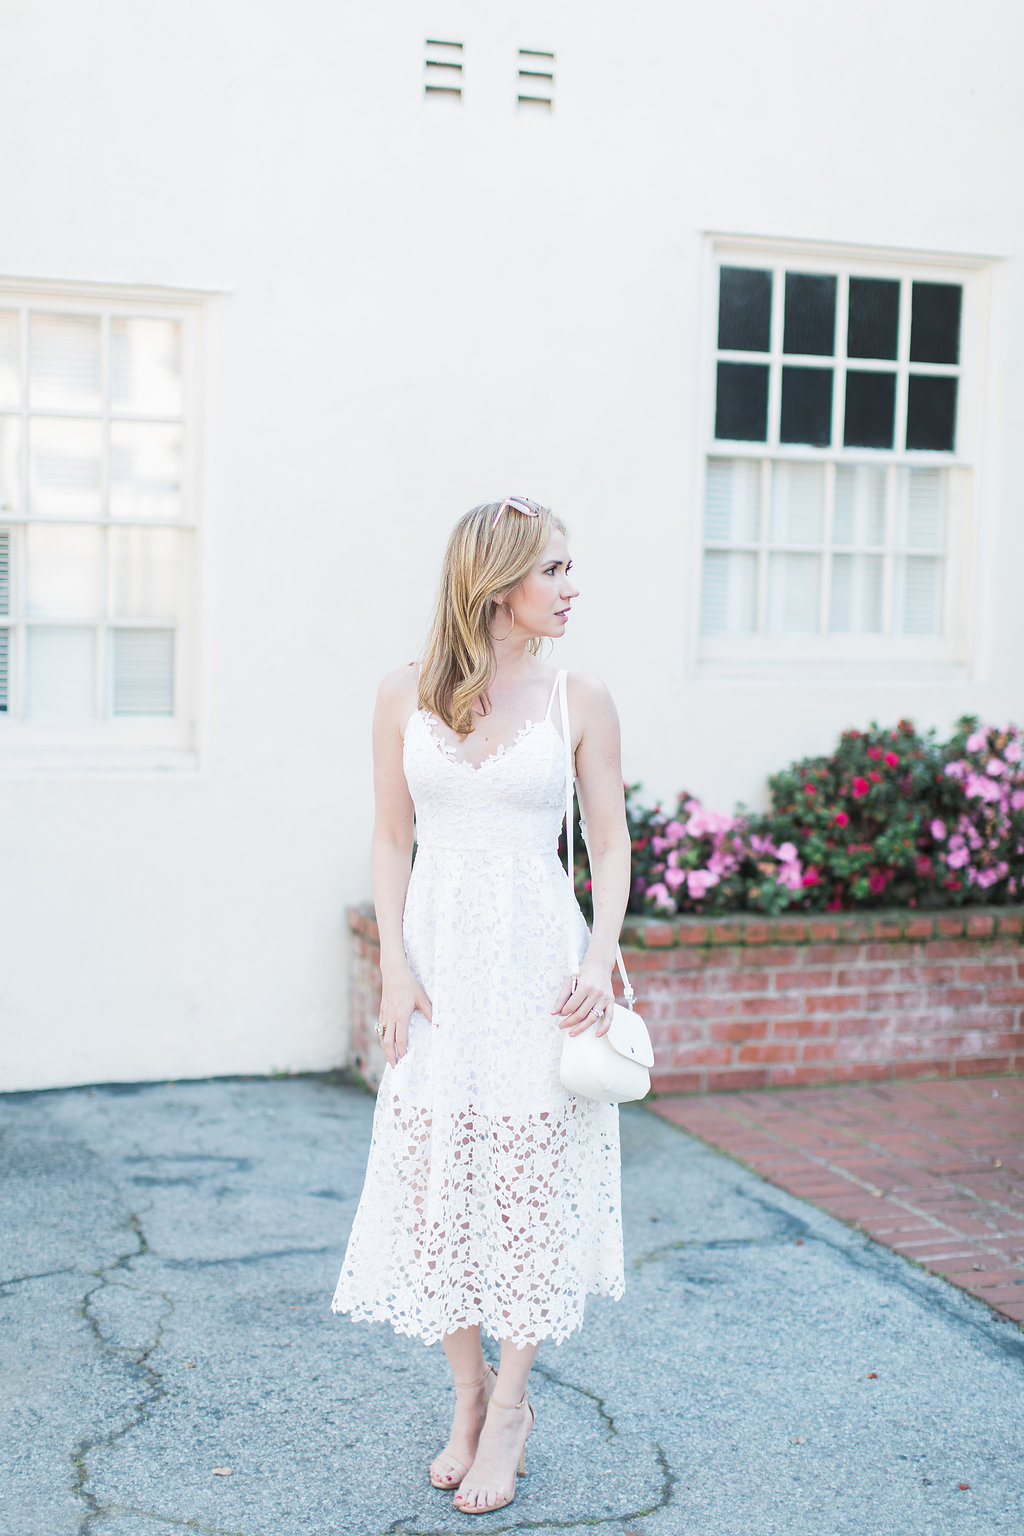 AshleyAJones.com/whitelacedress